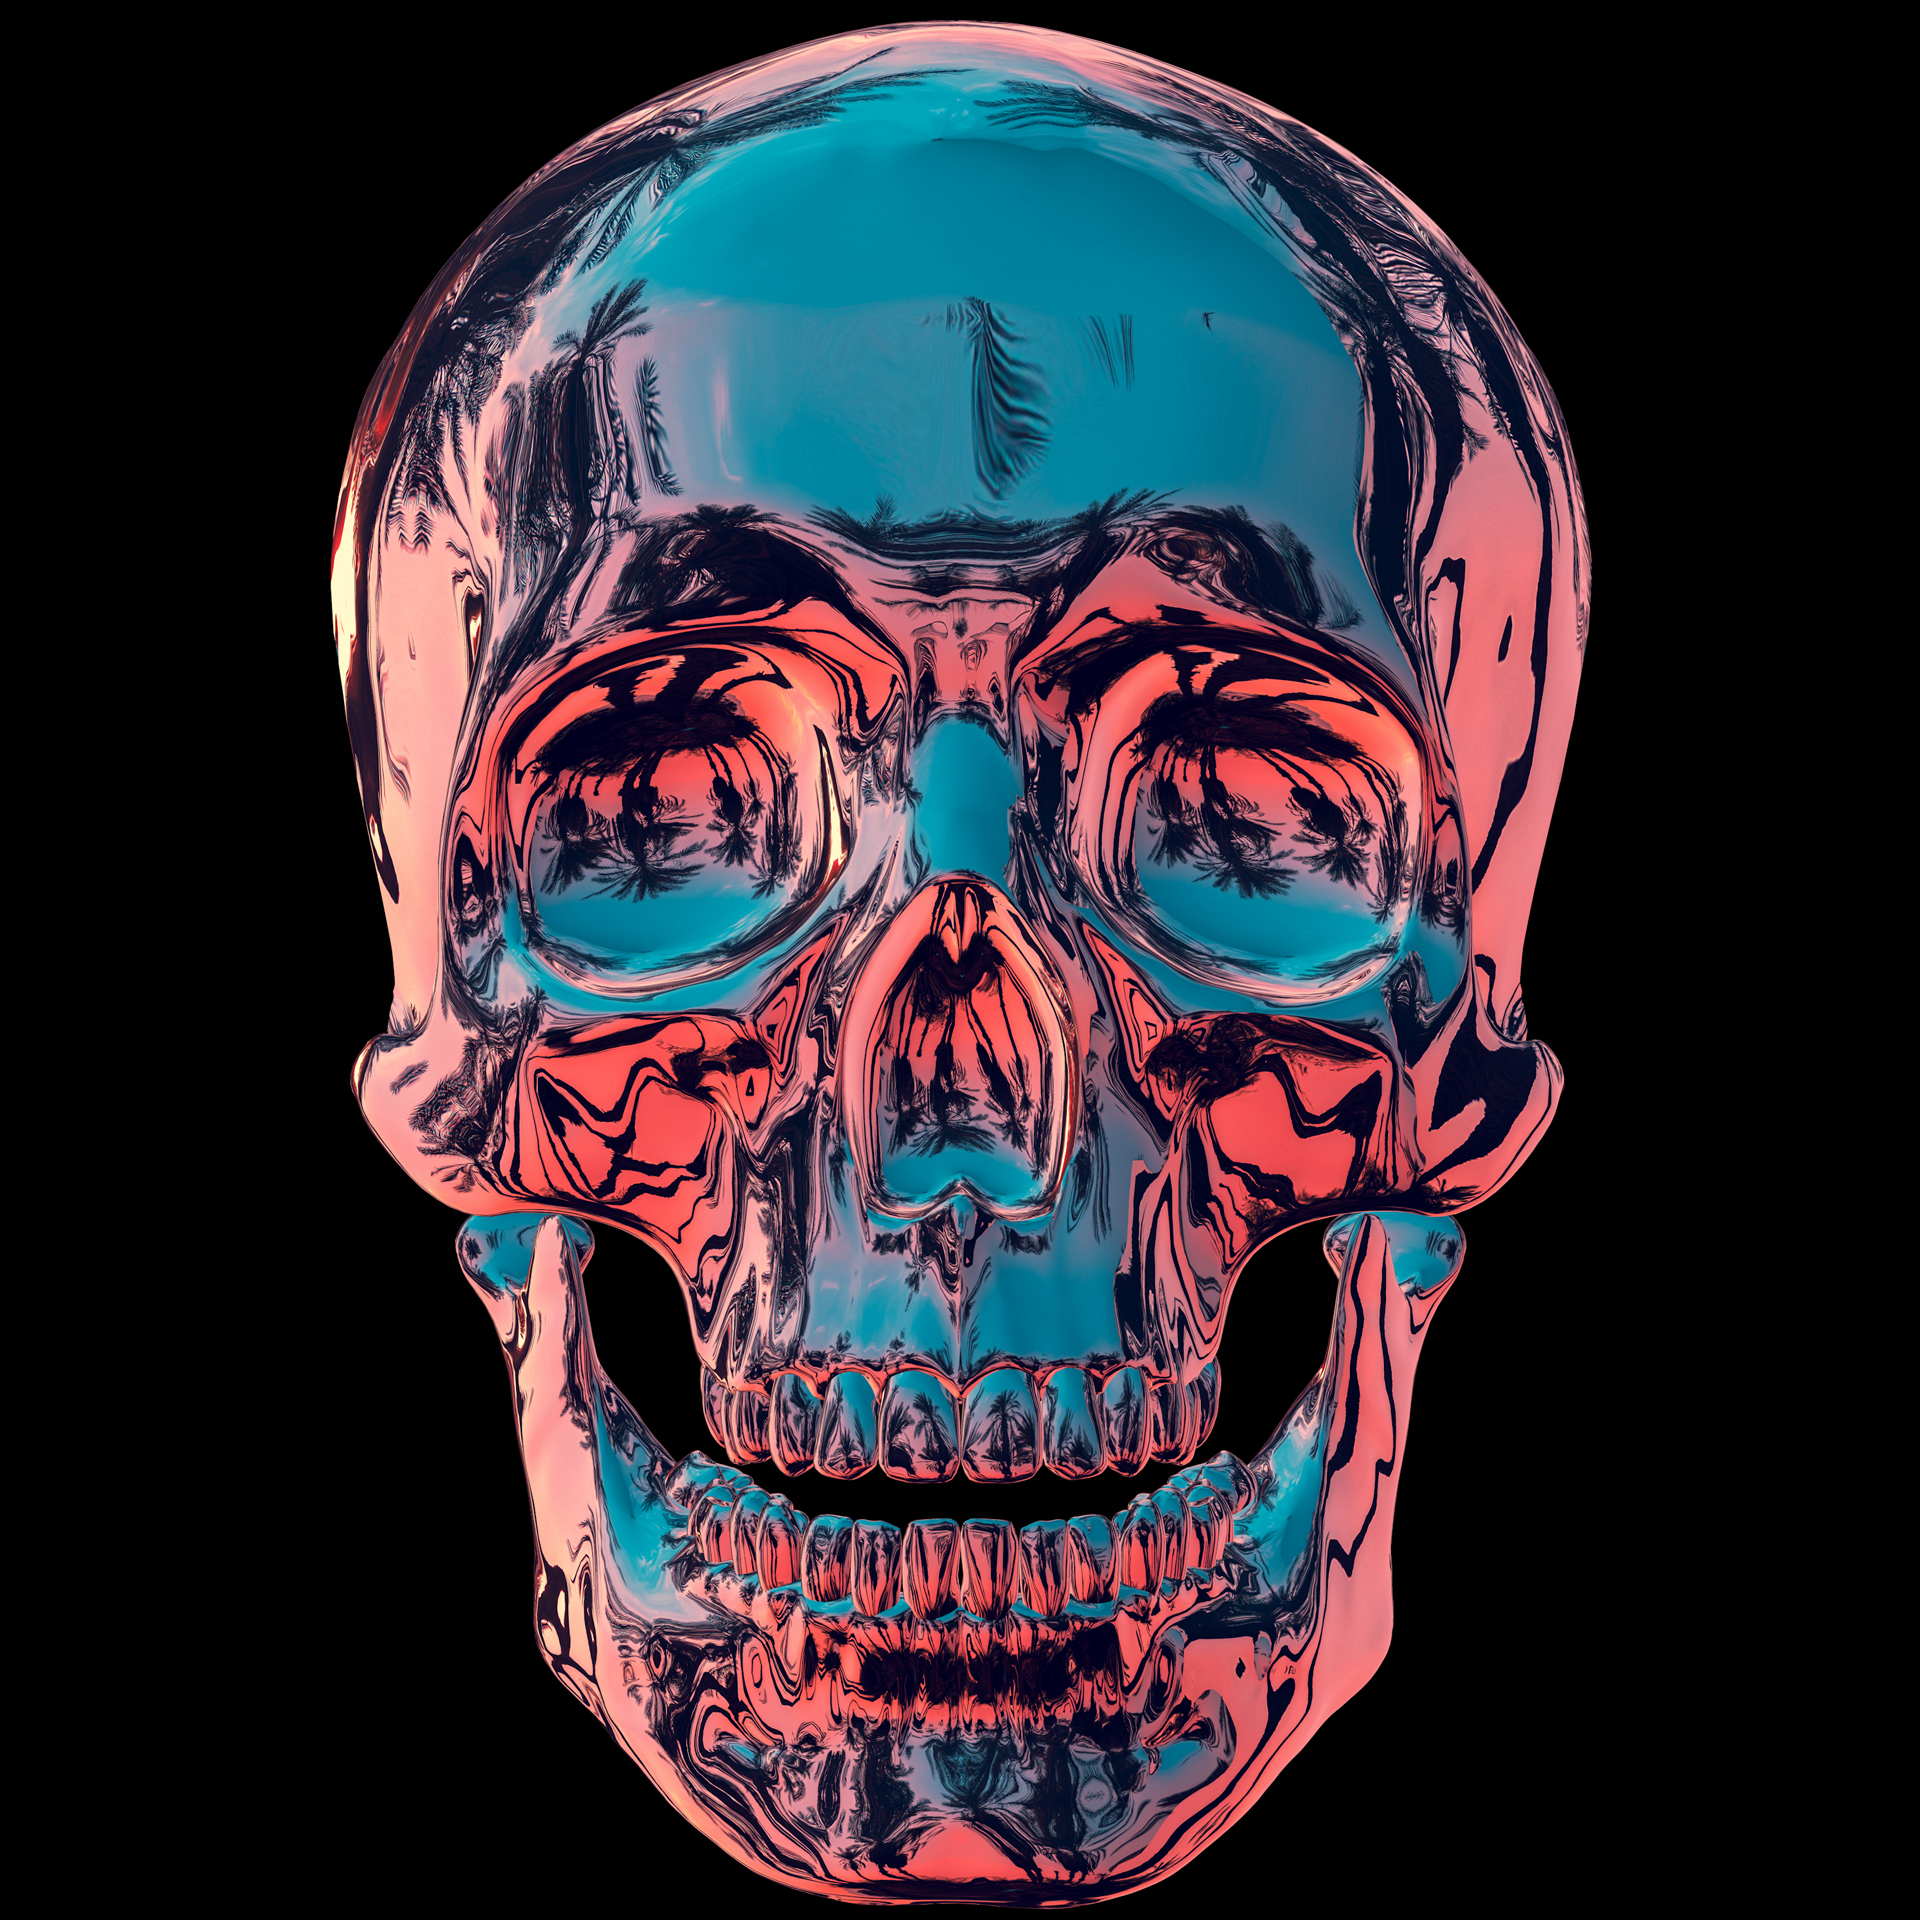 08_frontpictures.com-blog-max-barskih-skull